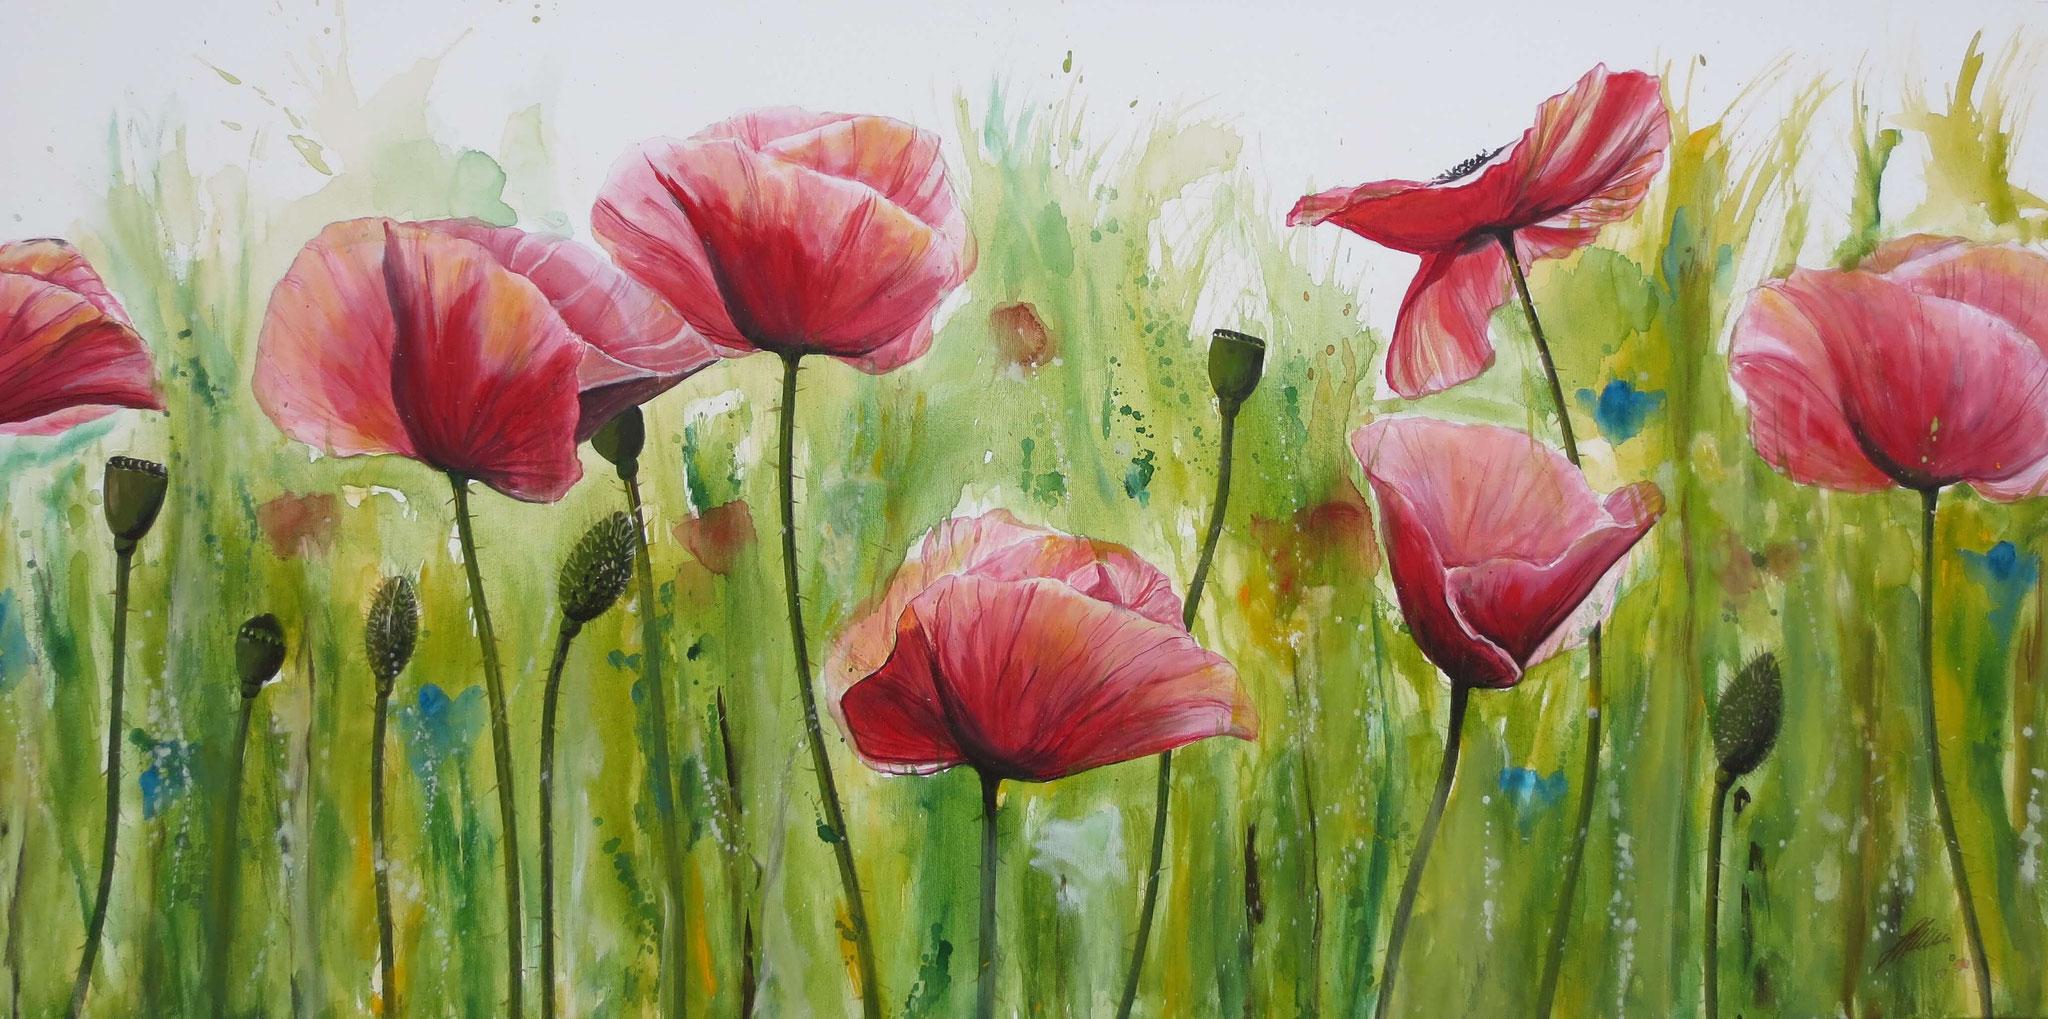 """Mohnblumen"" Acryl auf Leinwand 140 x 70 cm."